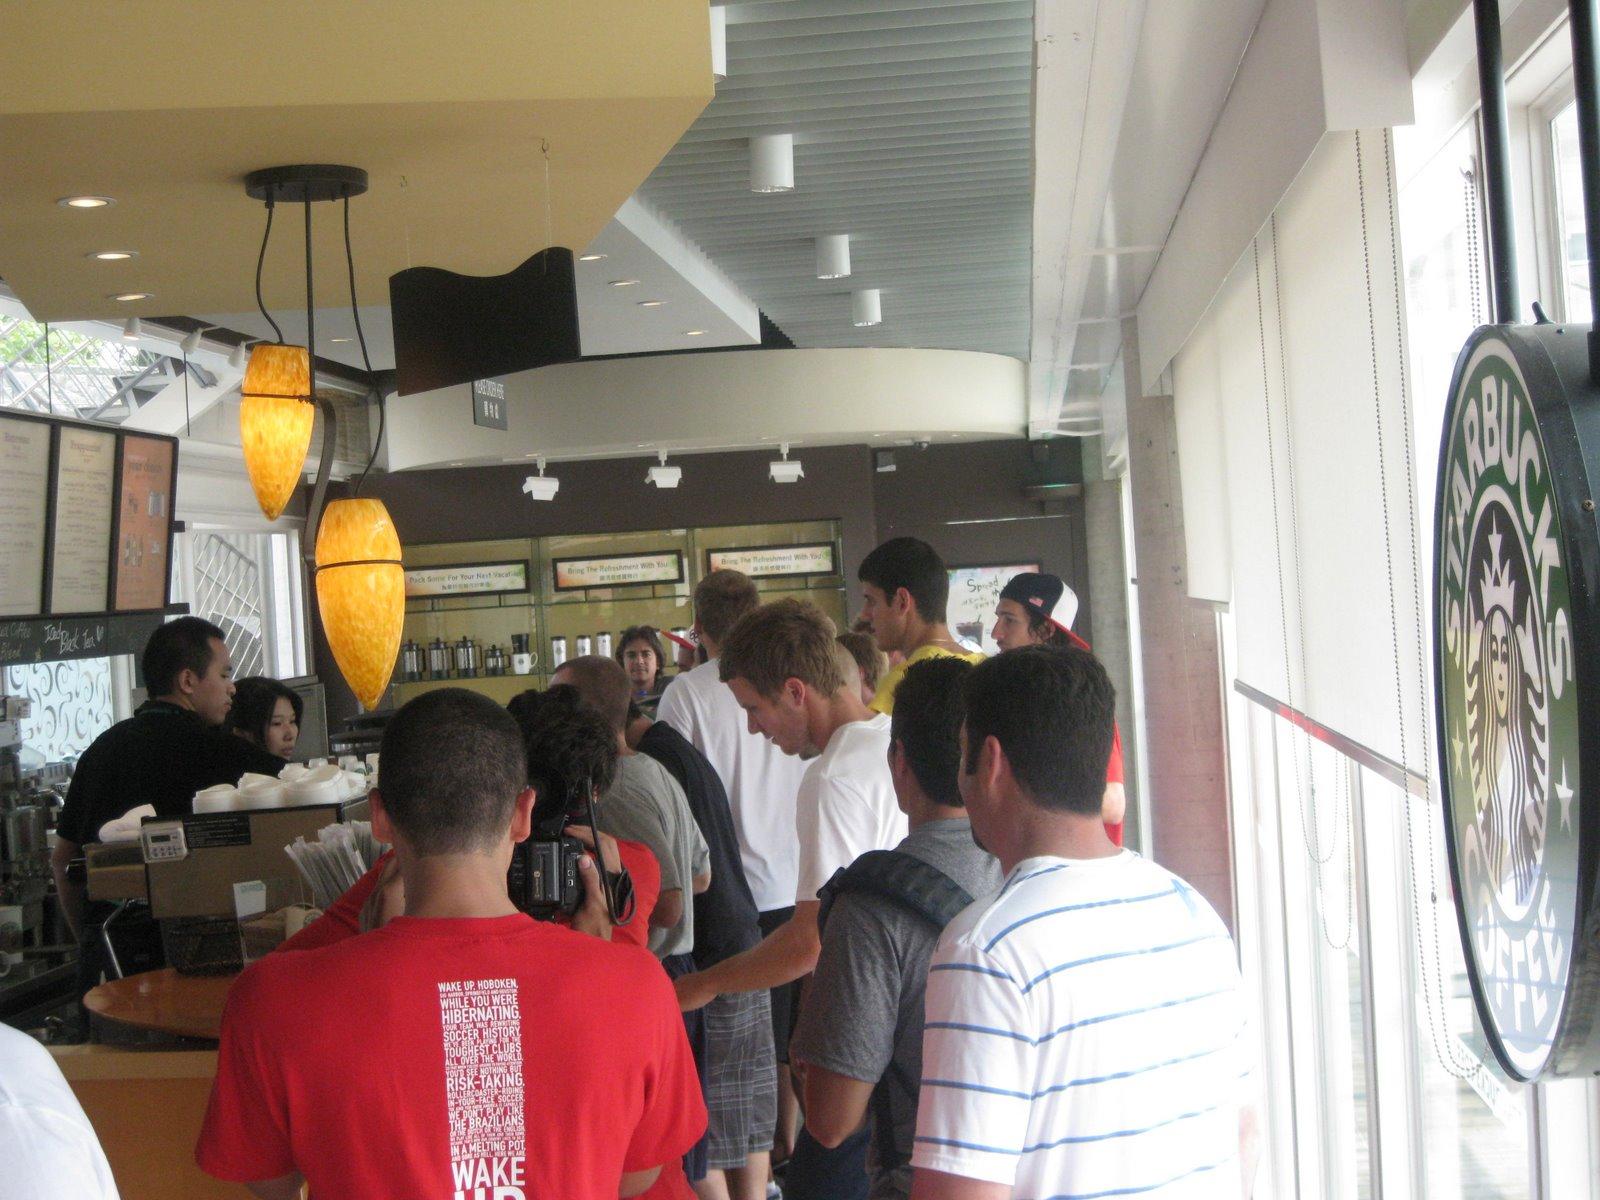 Olympians experiencing Hong Kong, at Starbucks. (USSoccer YNT-blog)